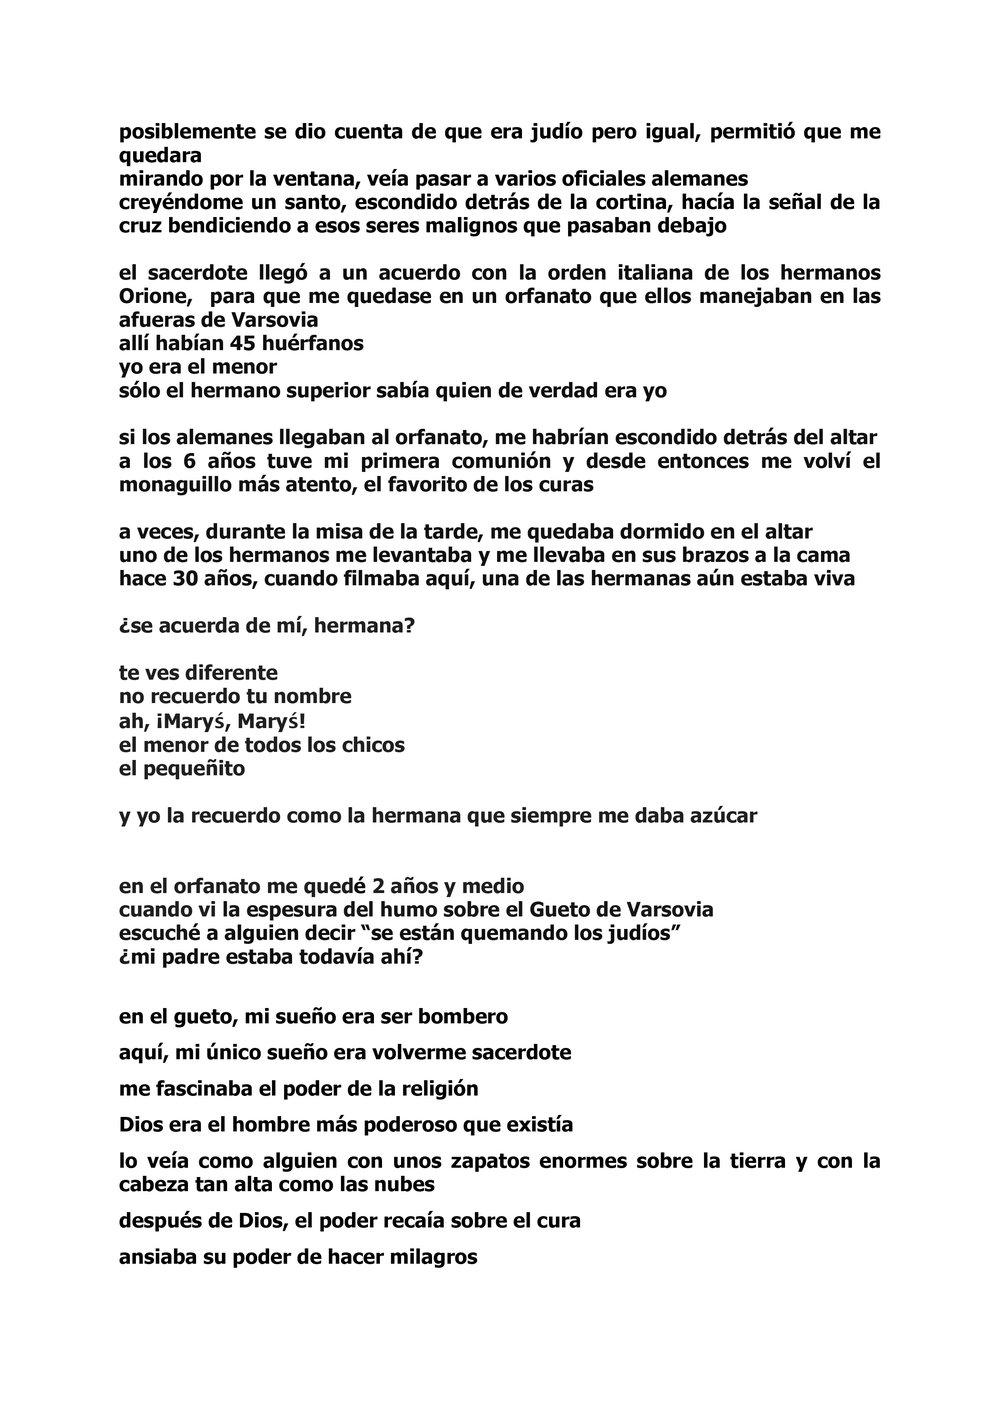 SPANISH-SCRIPT--11.jpg